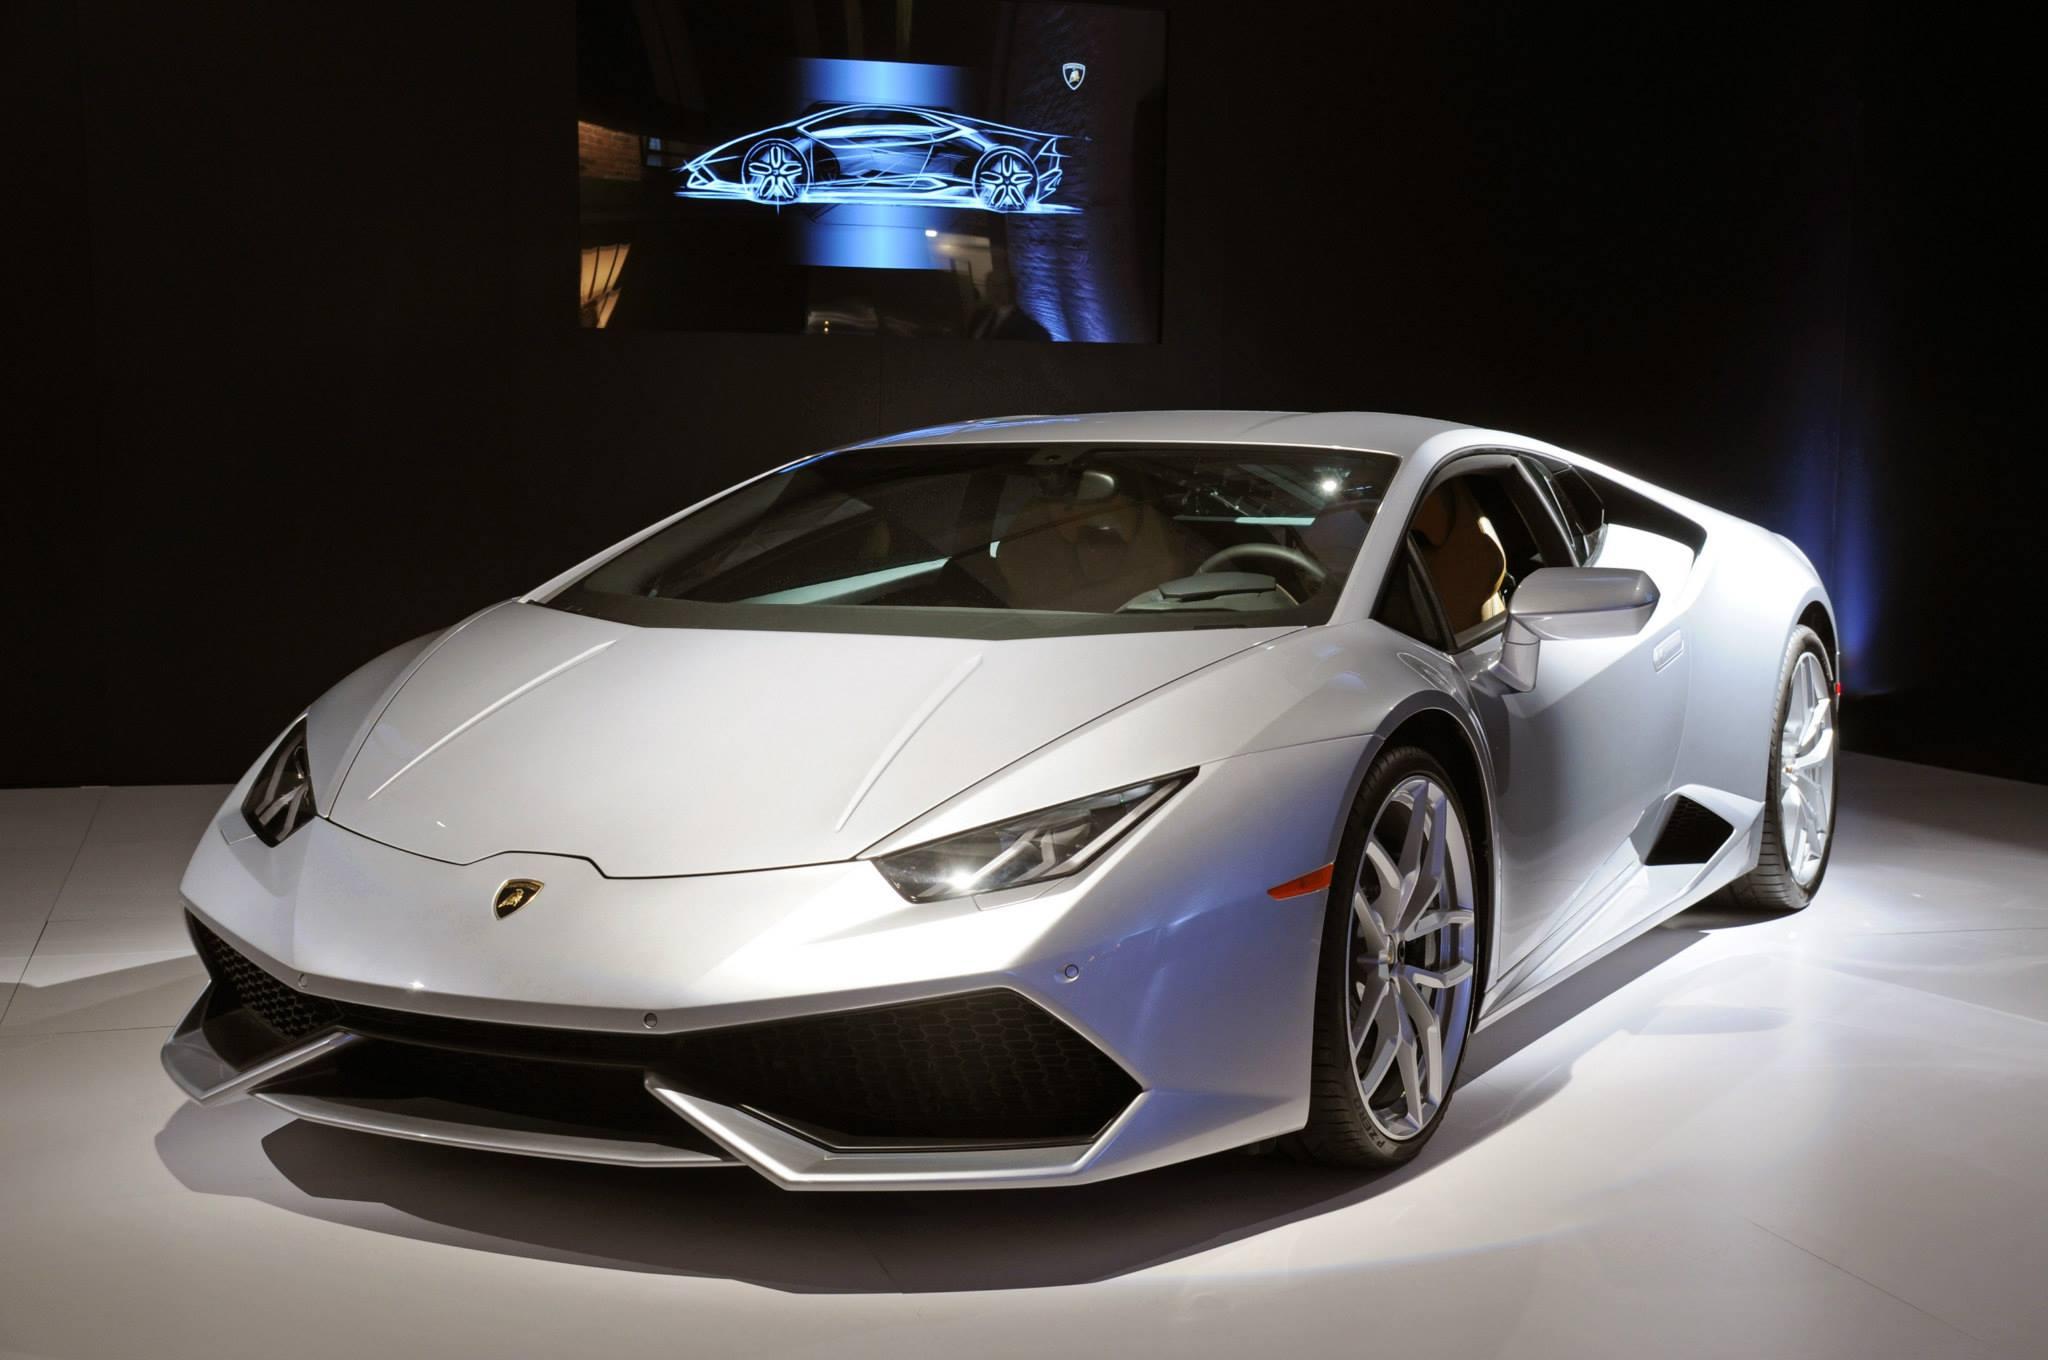 Lamborghini Huracan Showcased In New York At Bathhouse